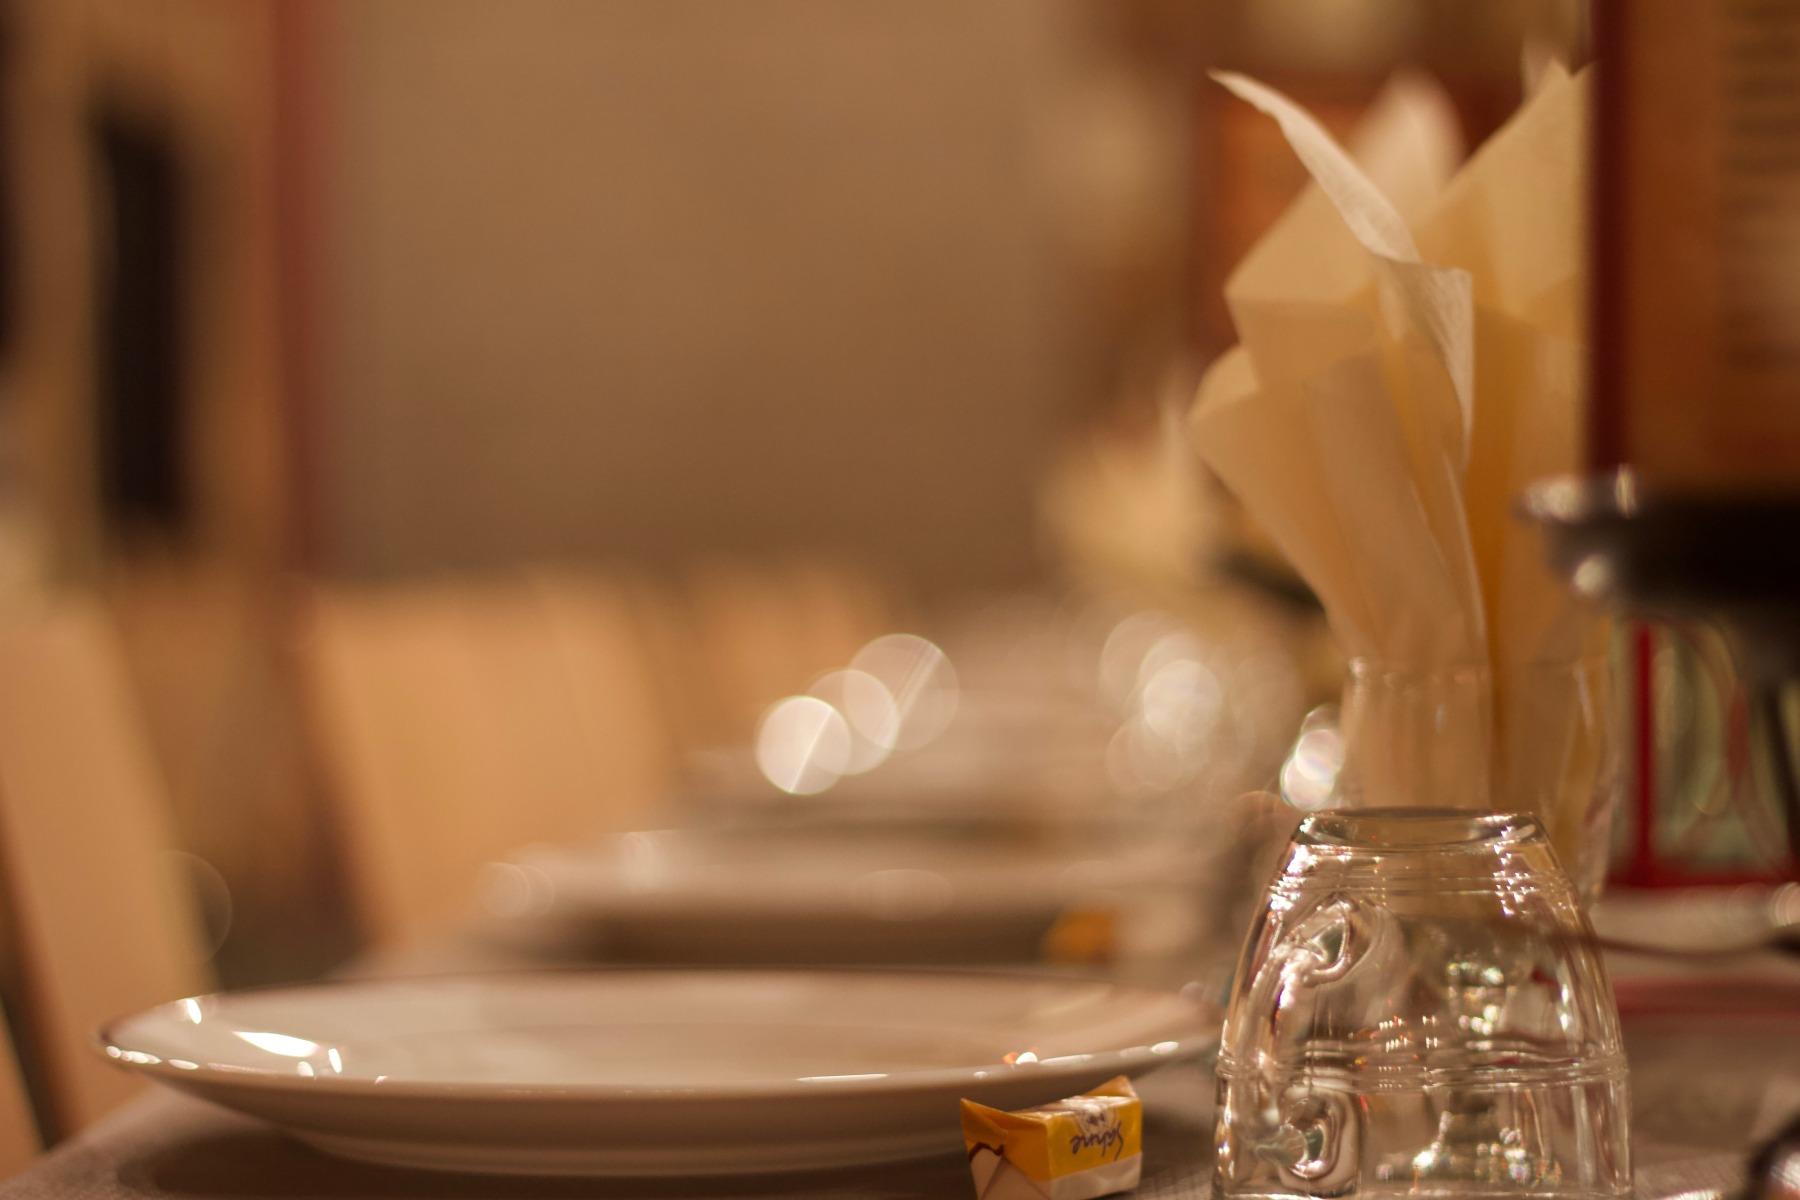 190216_best_souper_fondue2019_004